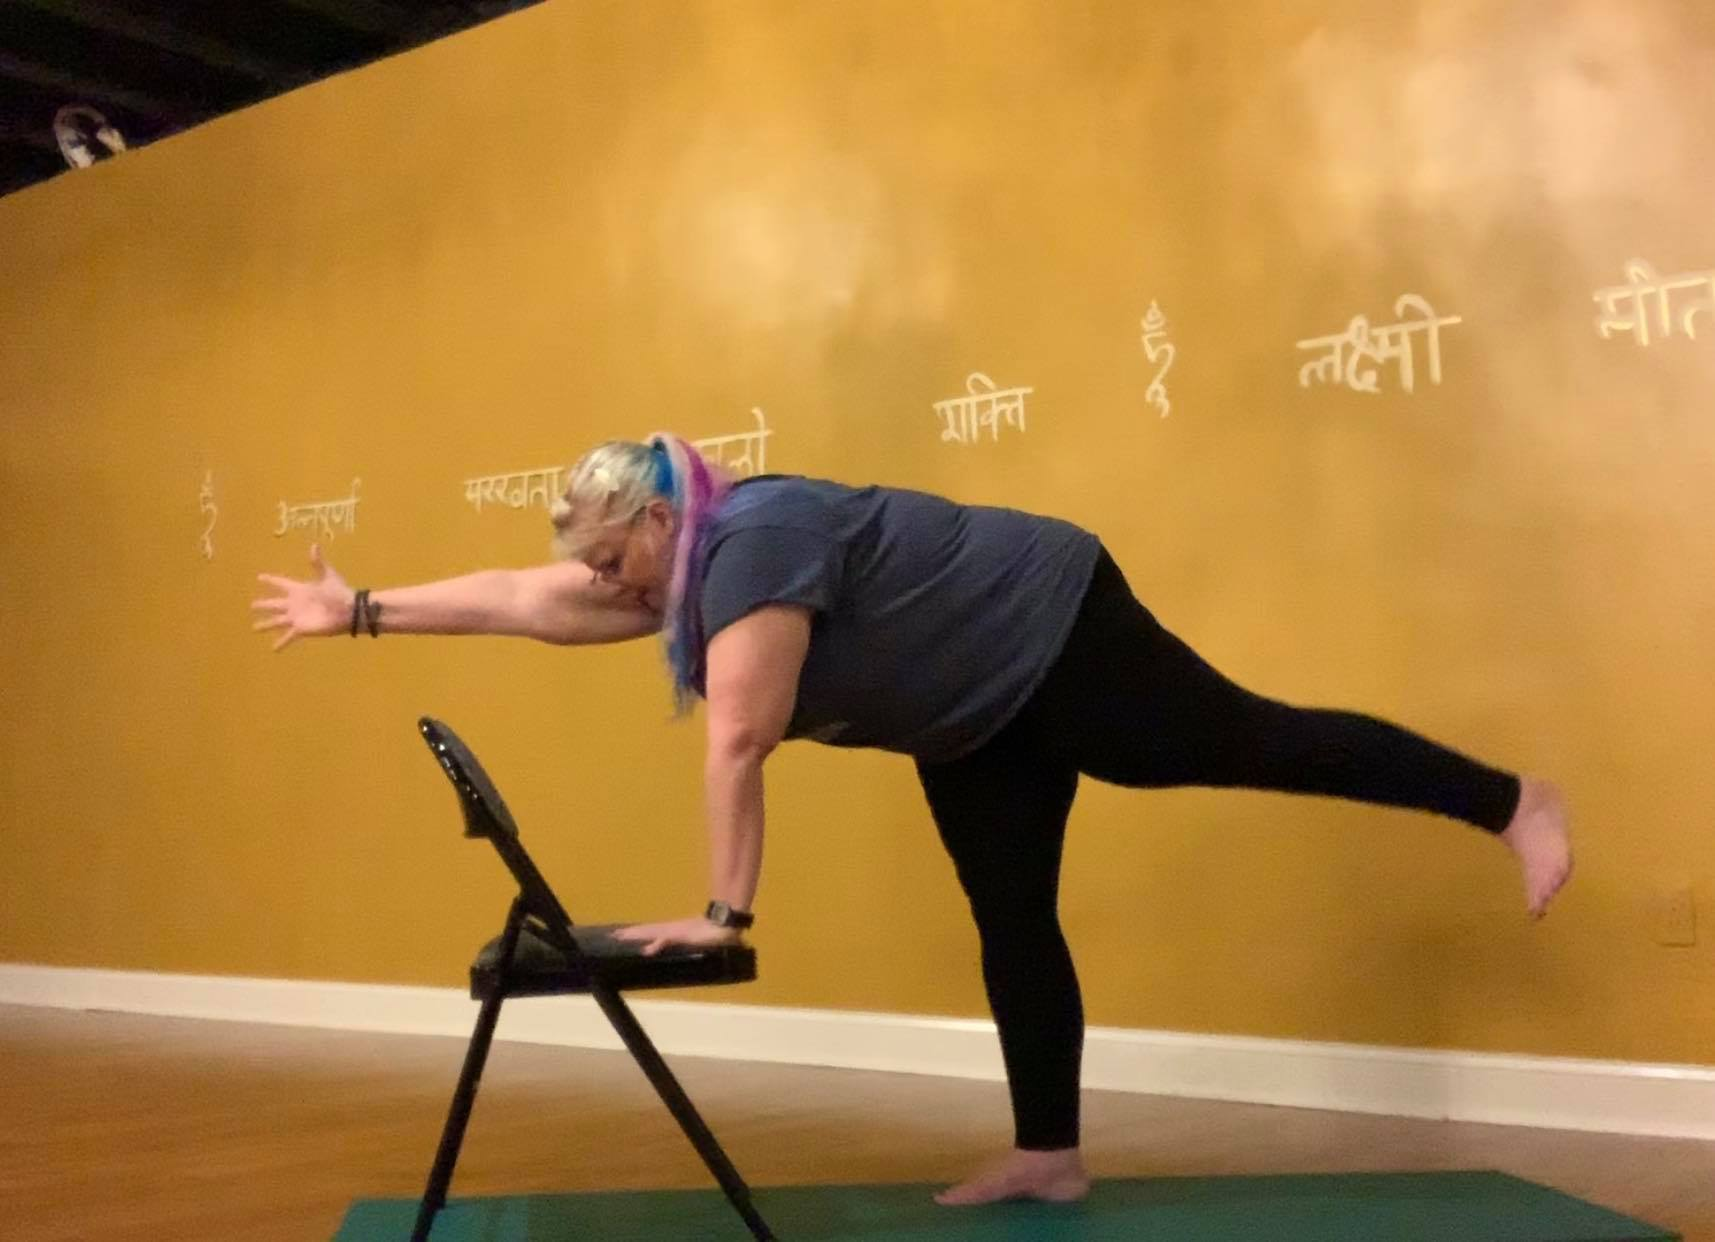 Chair Yoga: Neutral Spine Core Work (5:46)